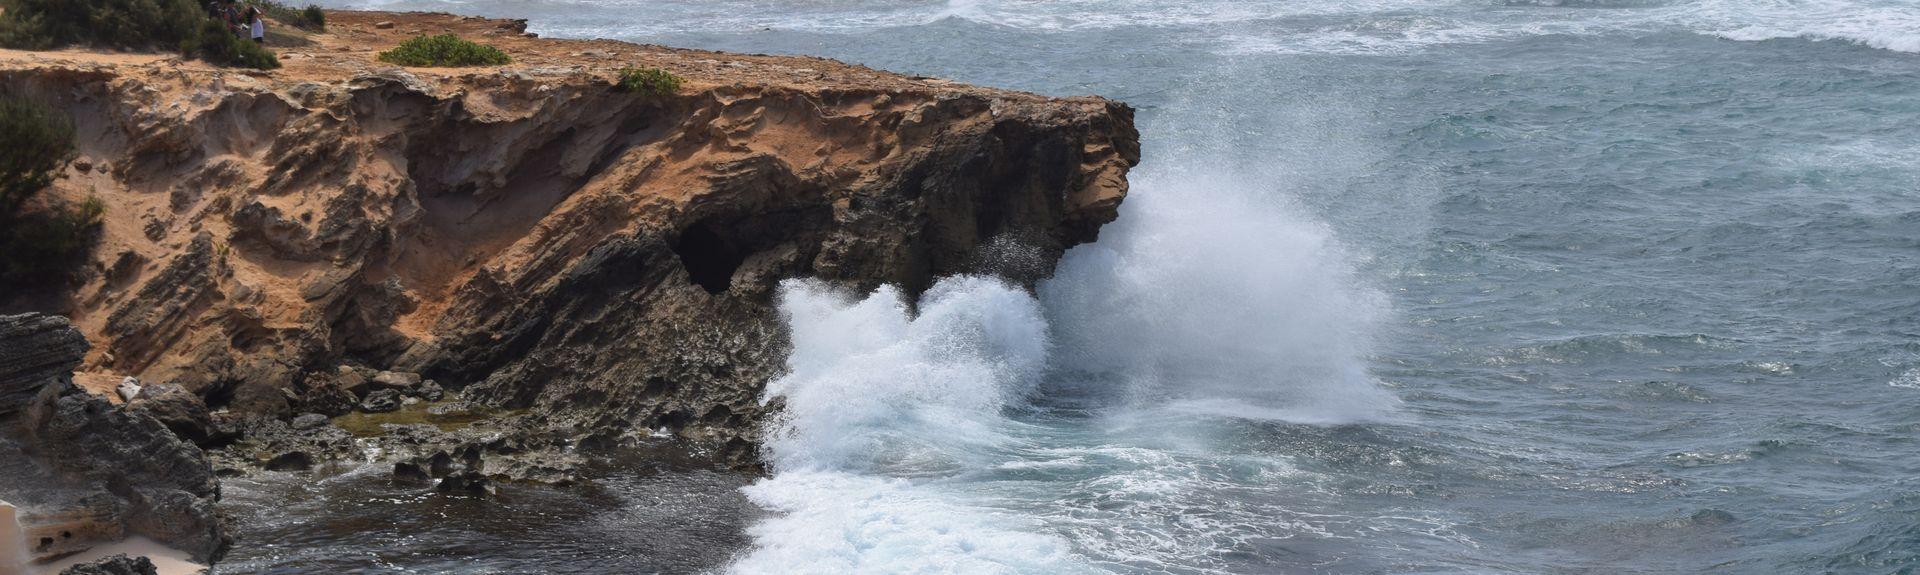 Lawai, Χαβάη, Ηνωμένες Πολιτείες